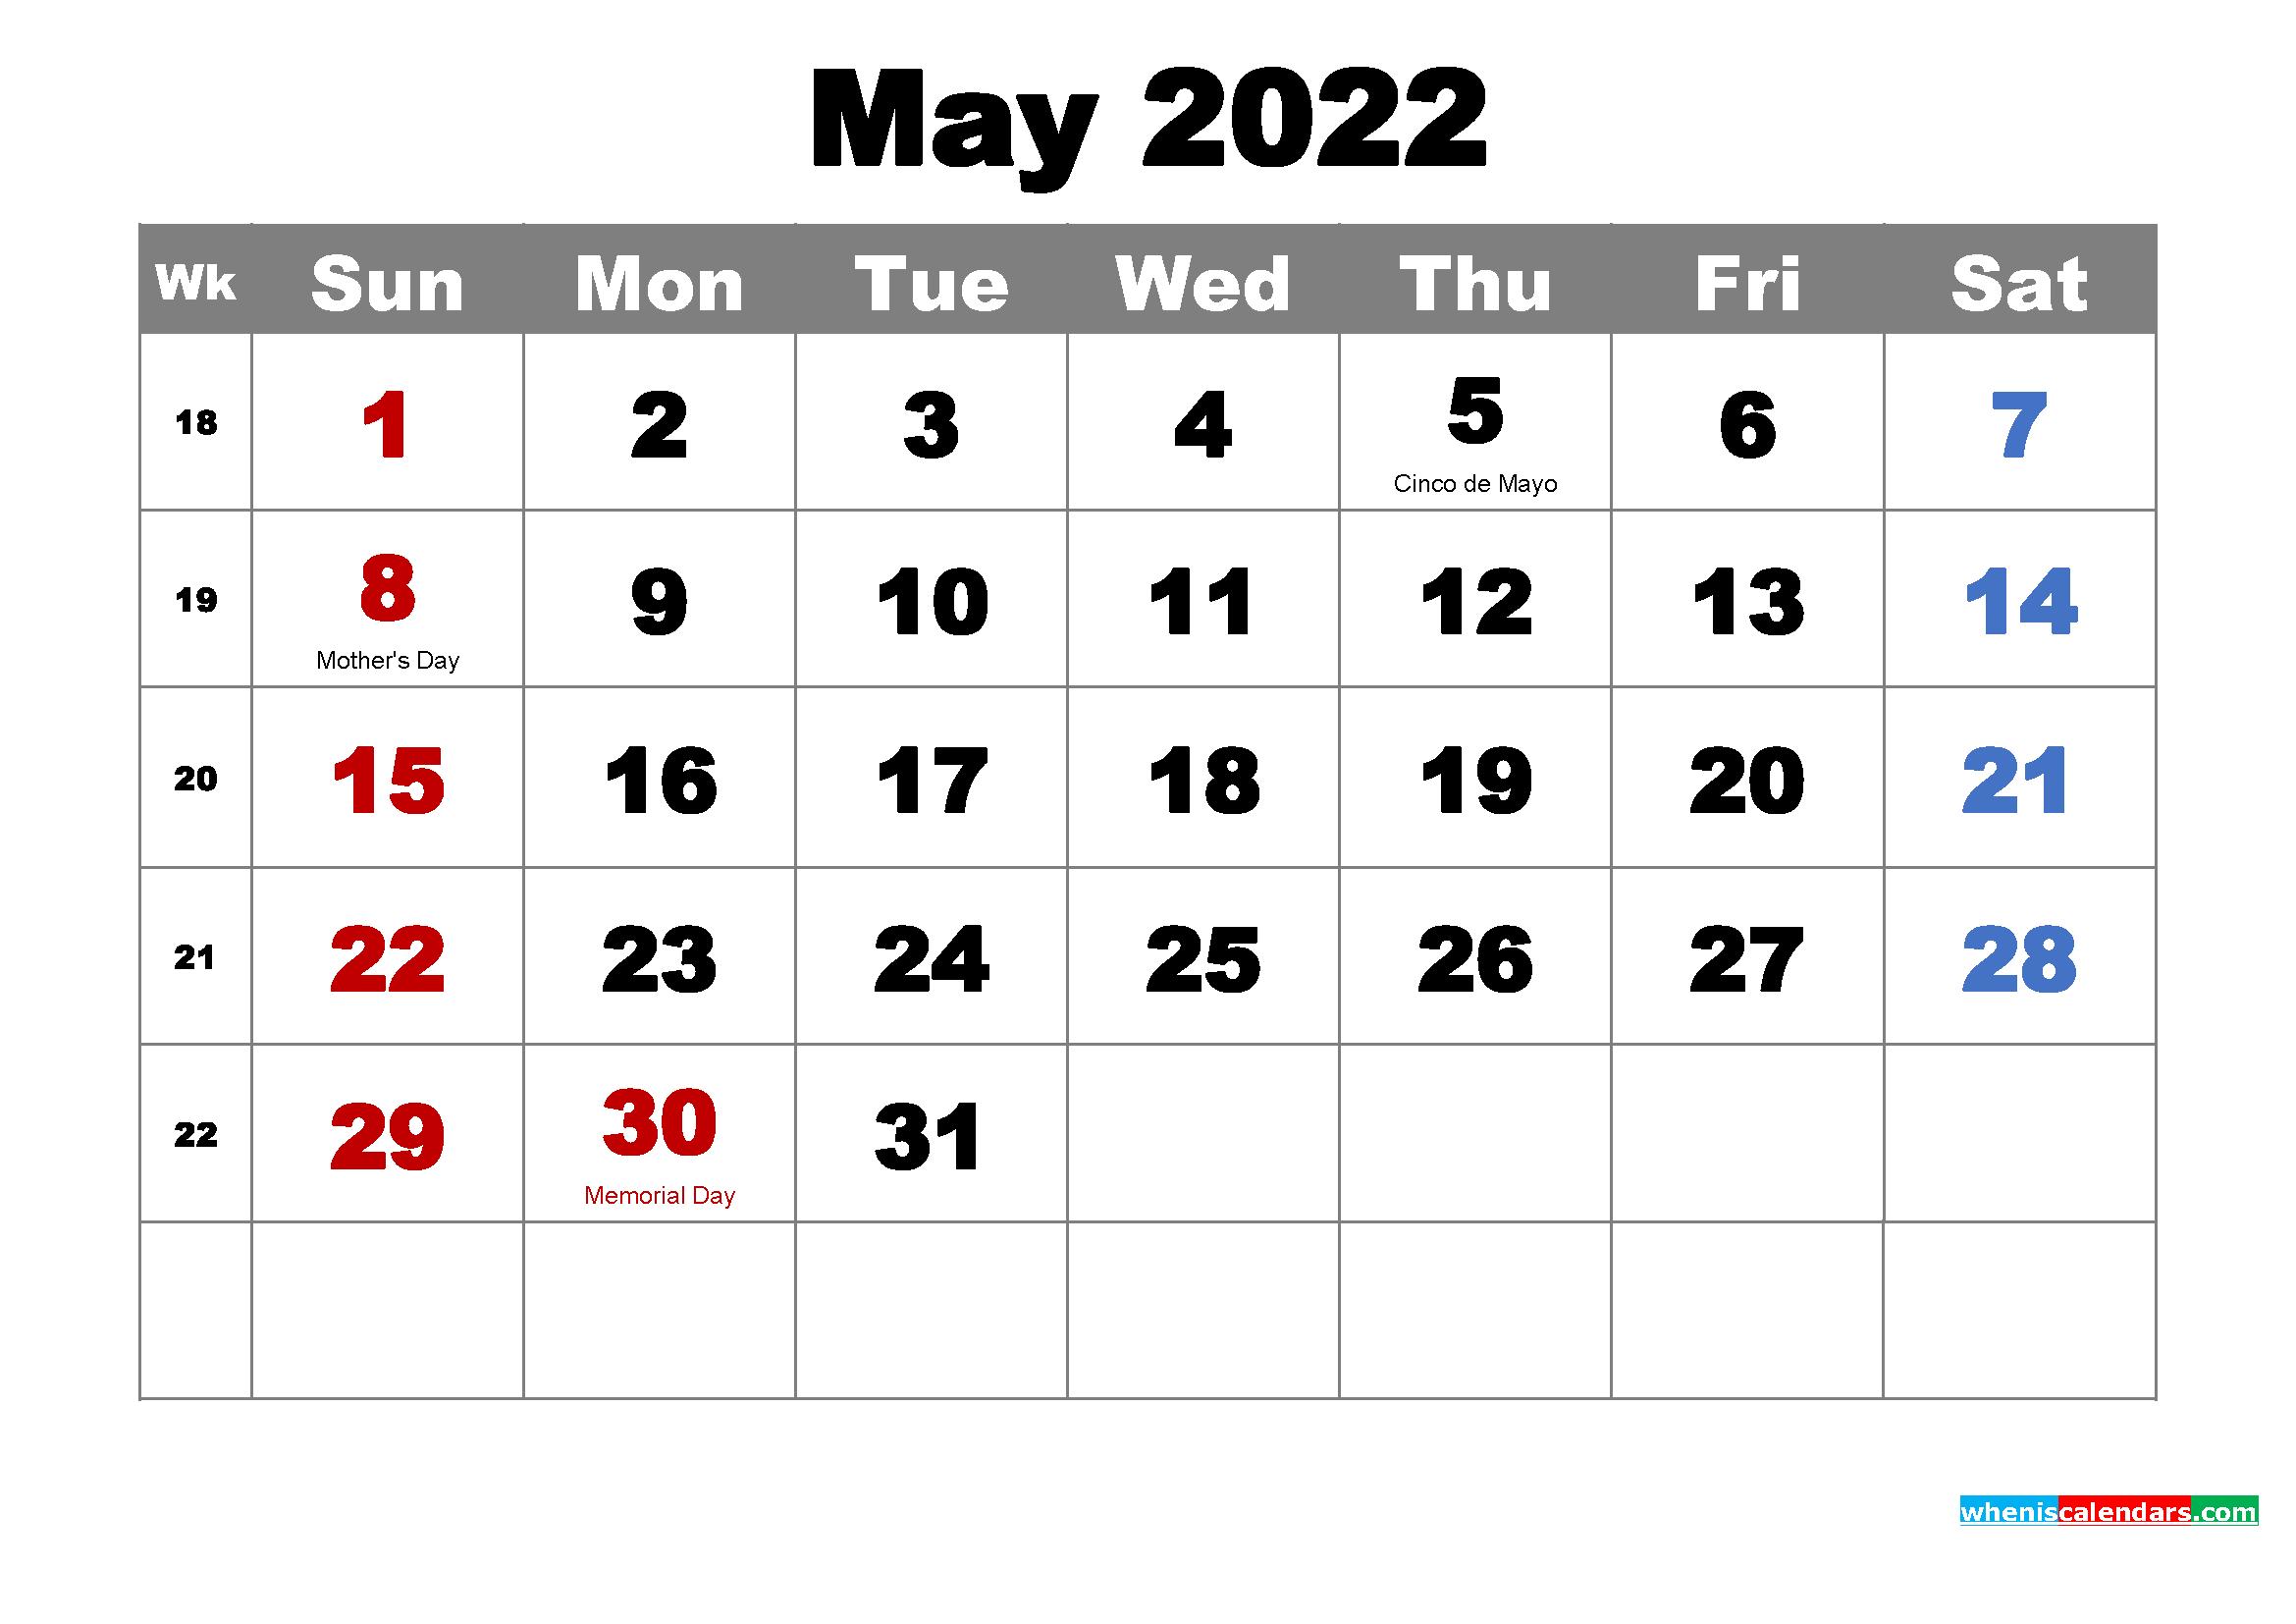 Blank Calendar May 2022.Printable May 2022 Calendar By Month Free Printable 2021 Monthly Calendar With Holidays